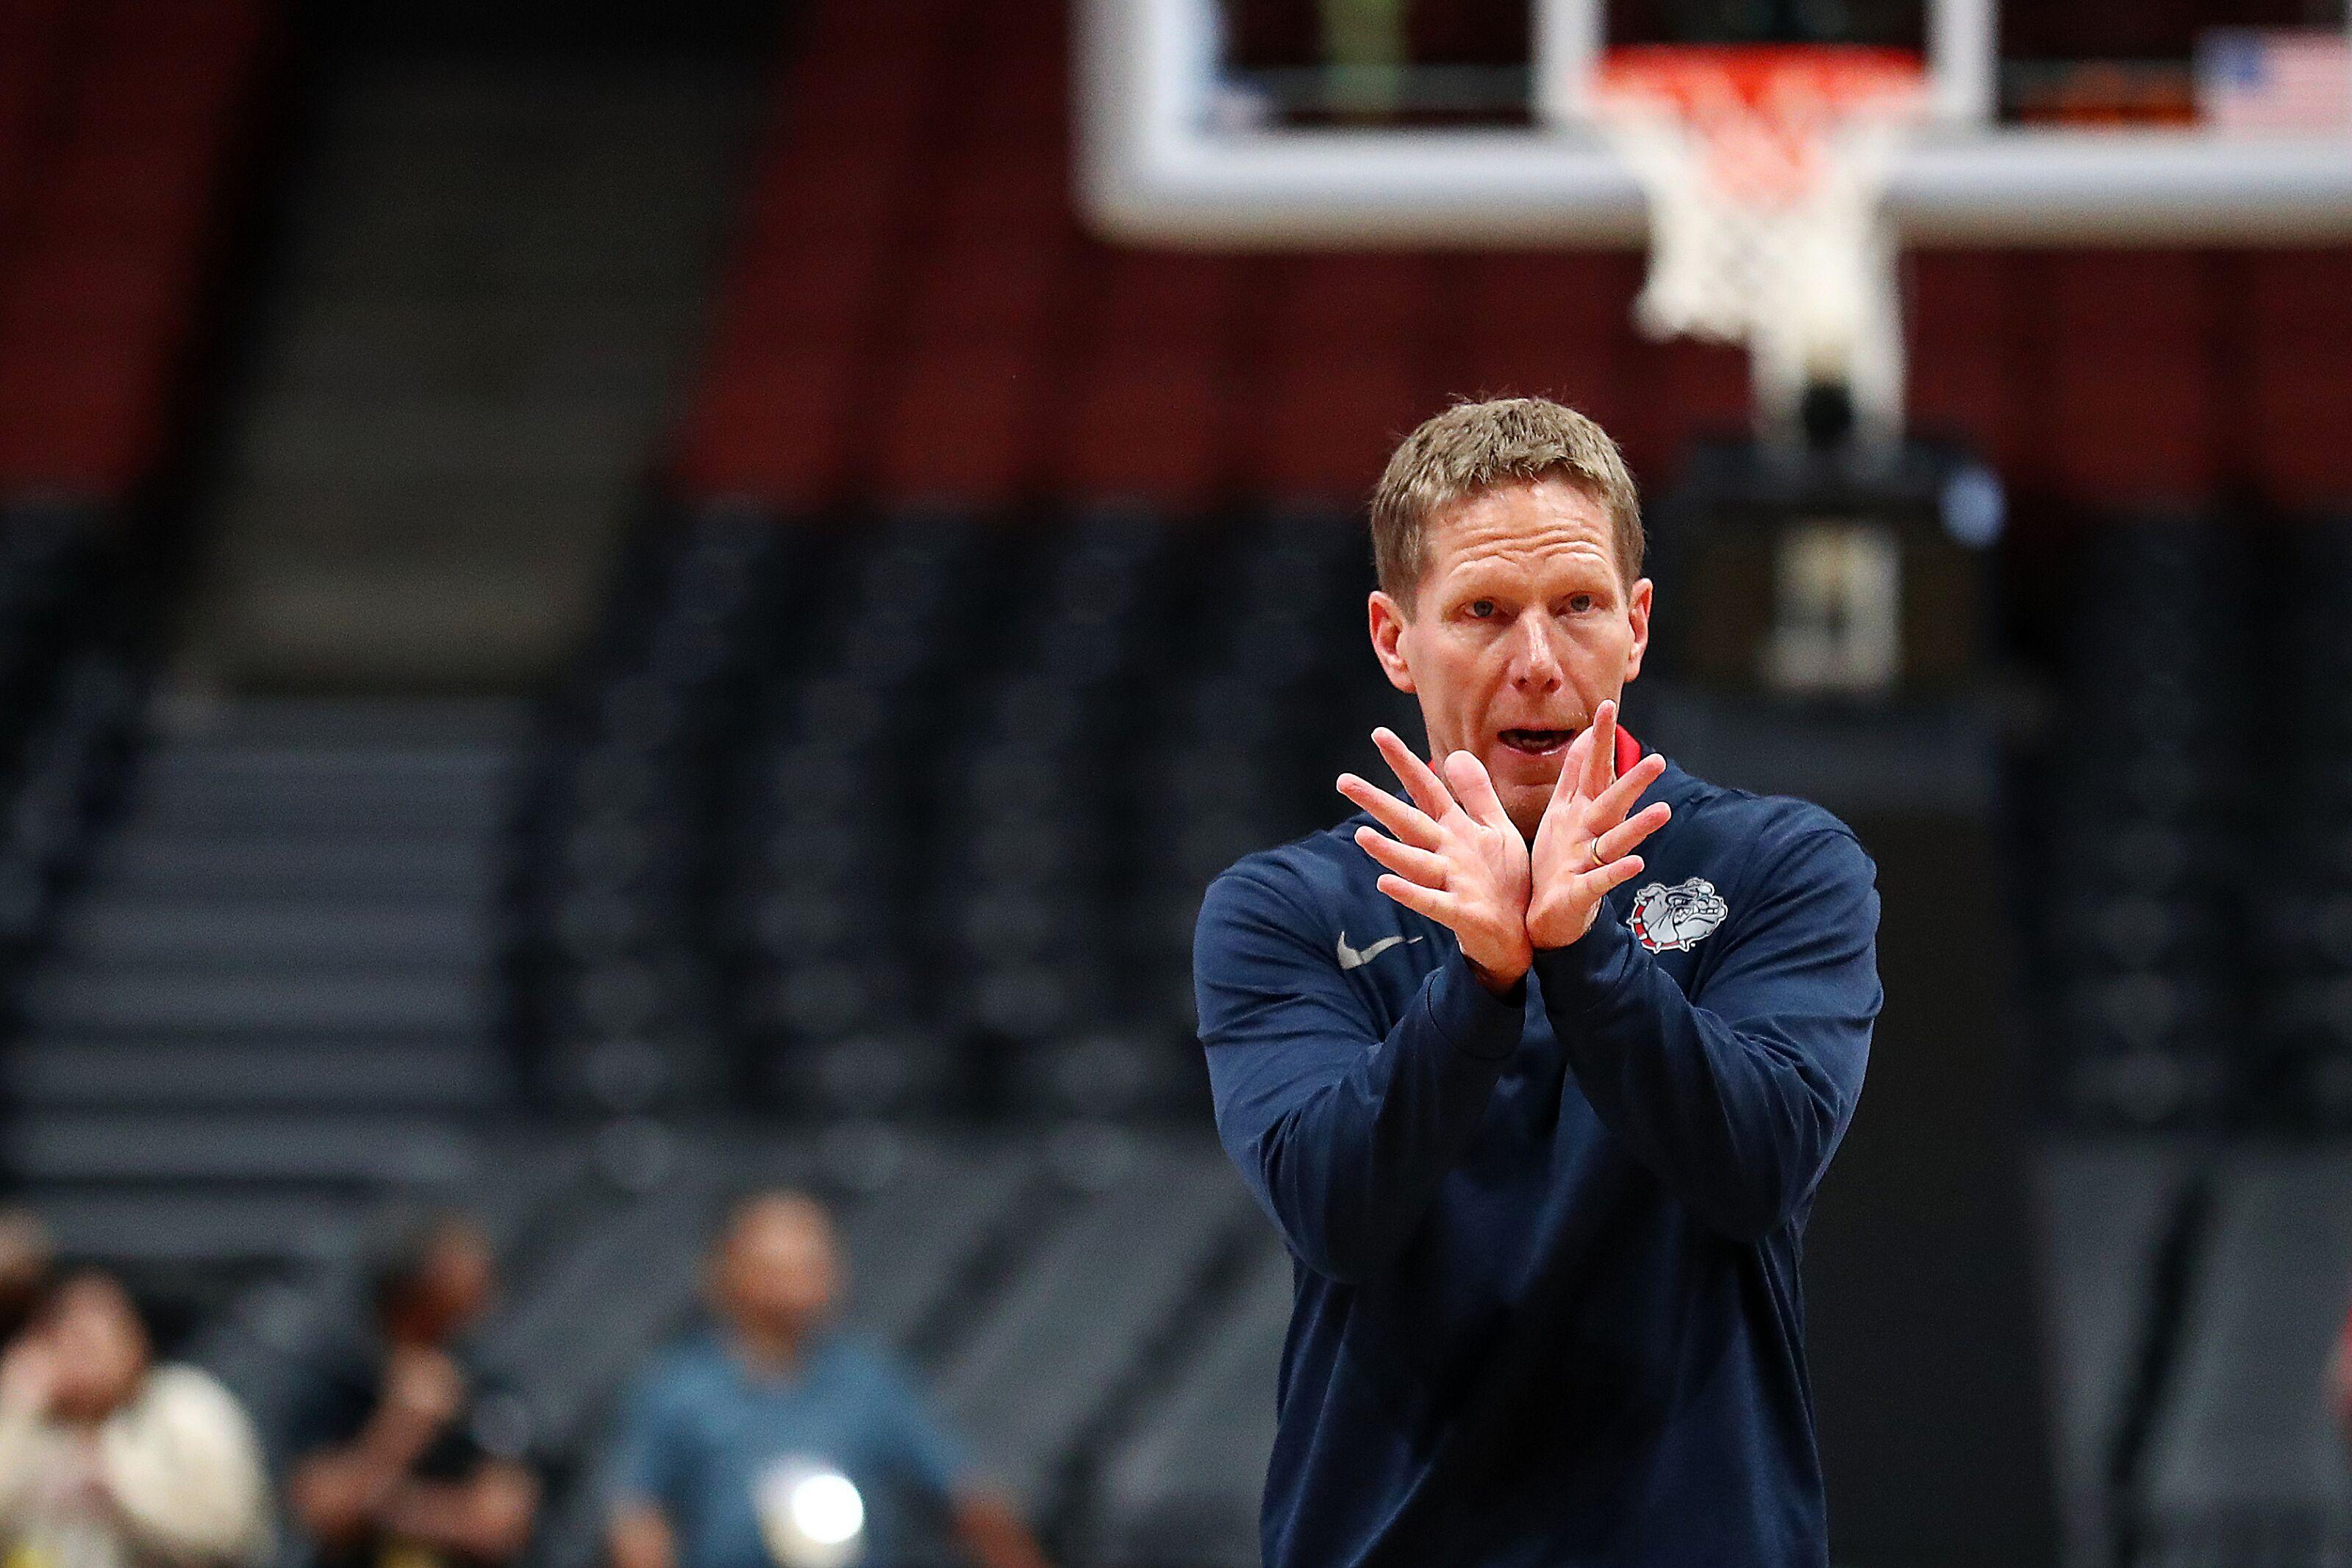 Gonzaga Basketball: 2019-20 keys to beating the Texas A&M Aggies